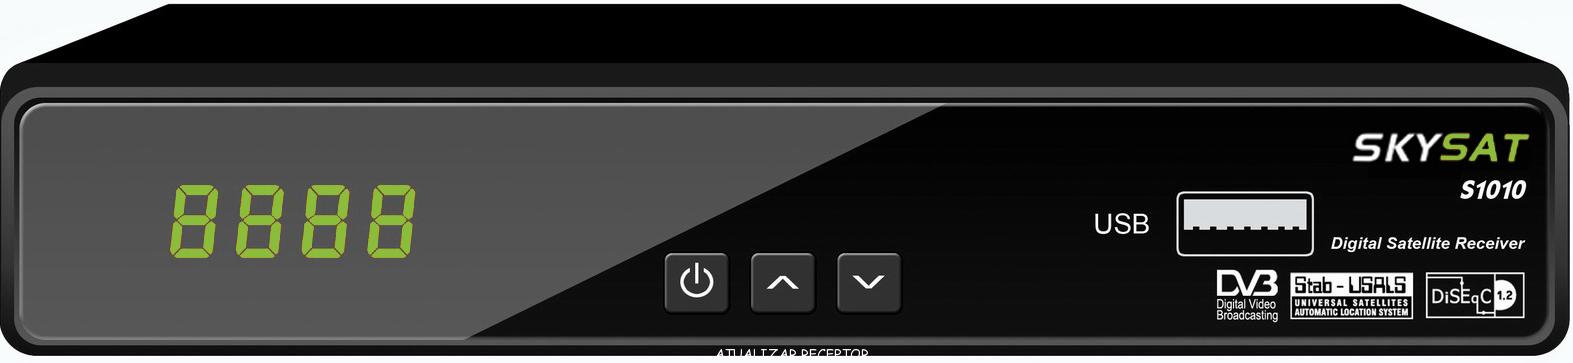 SKYSAT S1010 HD DEFINITIVA 58W E 22W